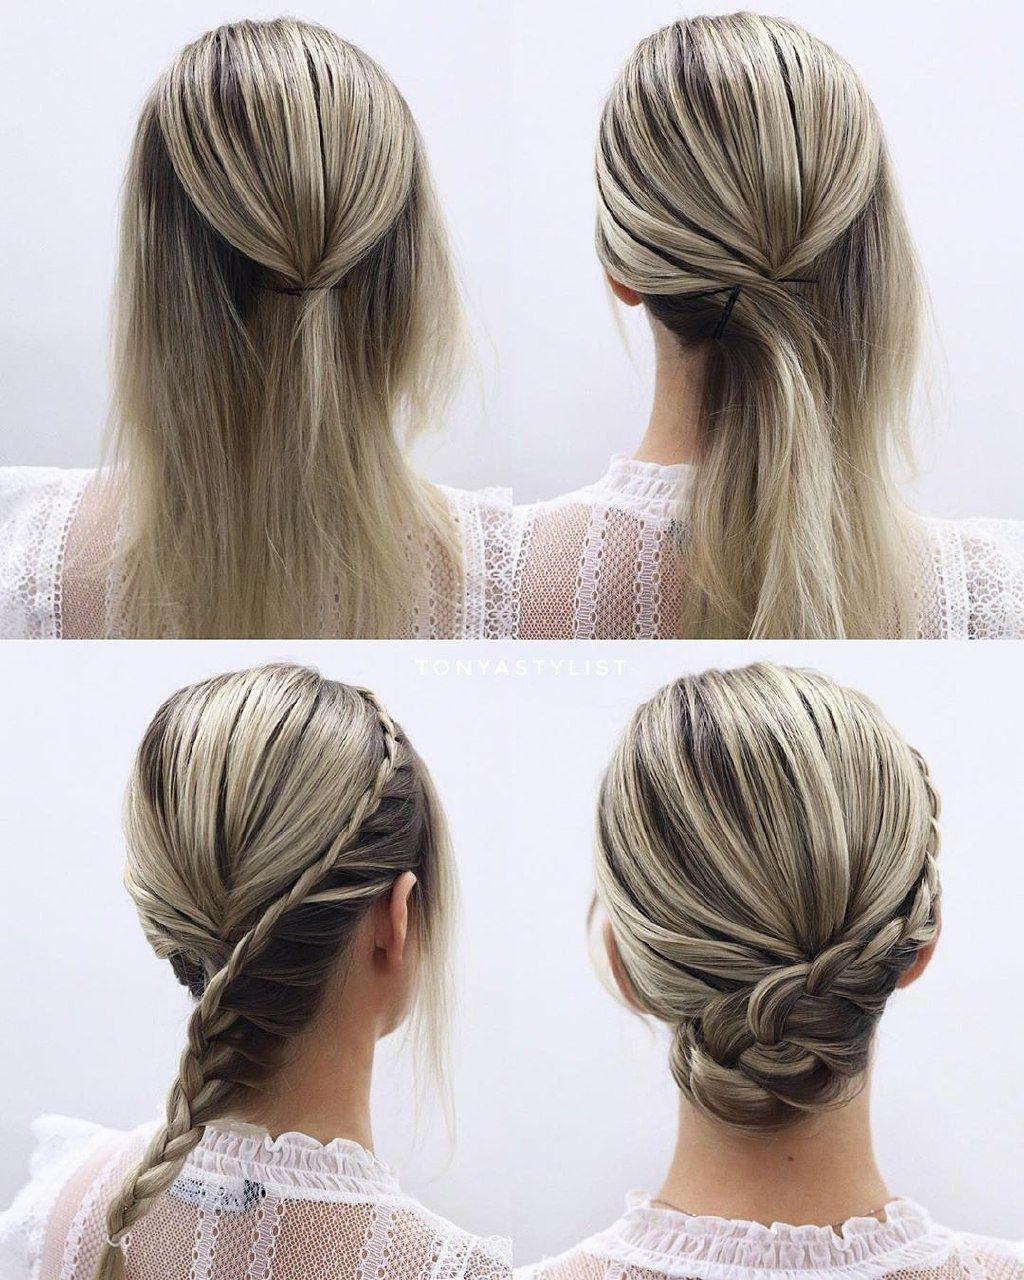 Hairfy Hair Tutorials On Instagram Cute Braided Hairstyle Tutorial Follow Us Hairfy For Mo Hair Tutorial Long Hair Styles Wedding Hairstyles For Long Hair